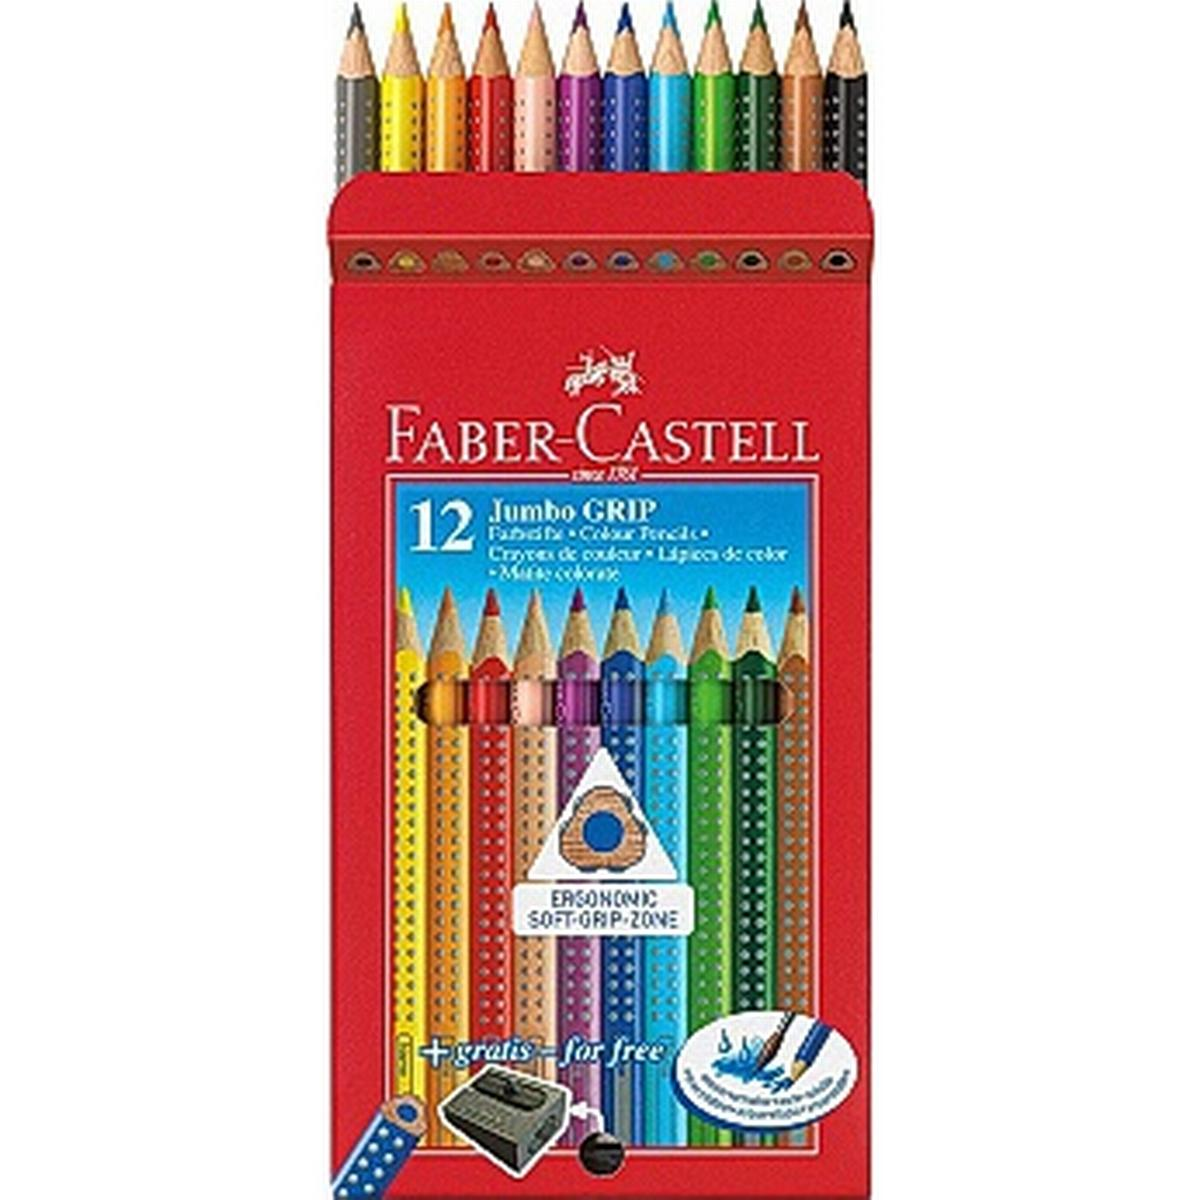 faber castell pricerunner